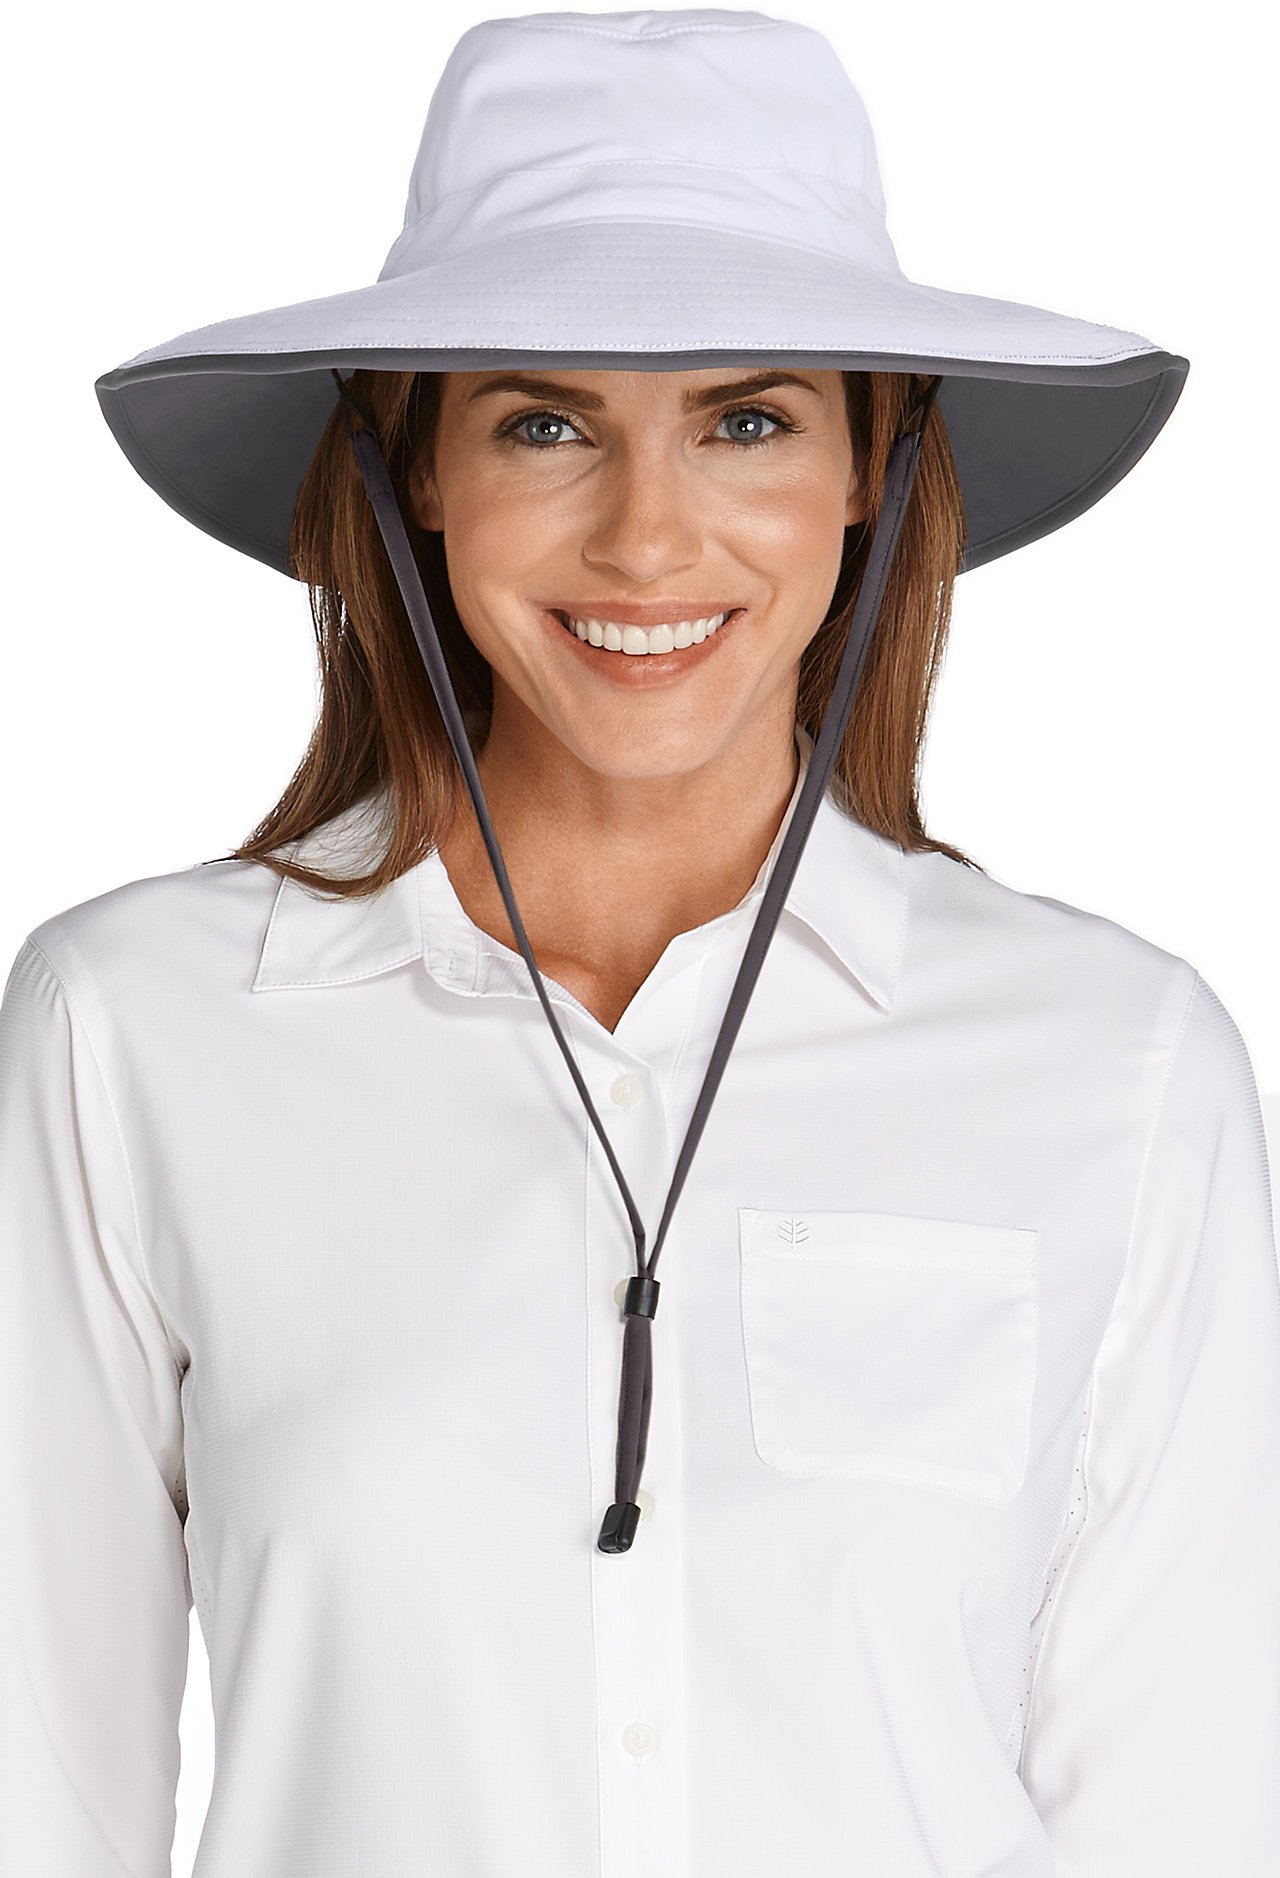 Coolibar UPF 50+ Women's Shapeable Sun Catcher Hat - Sun Protective , White/Carbon , One Size